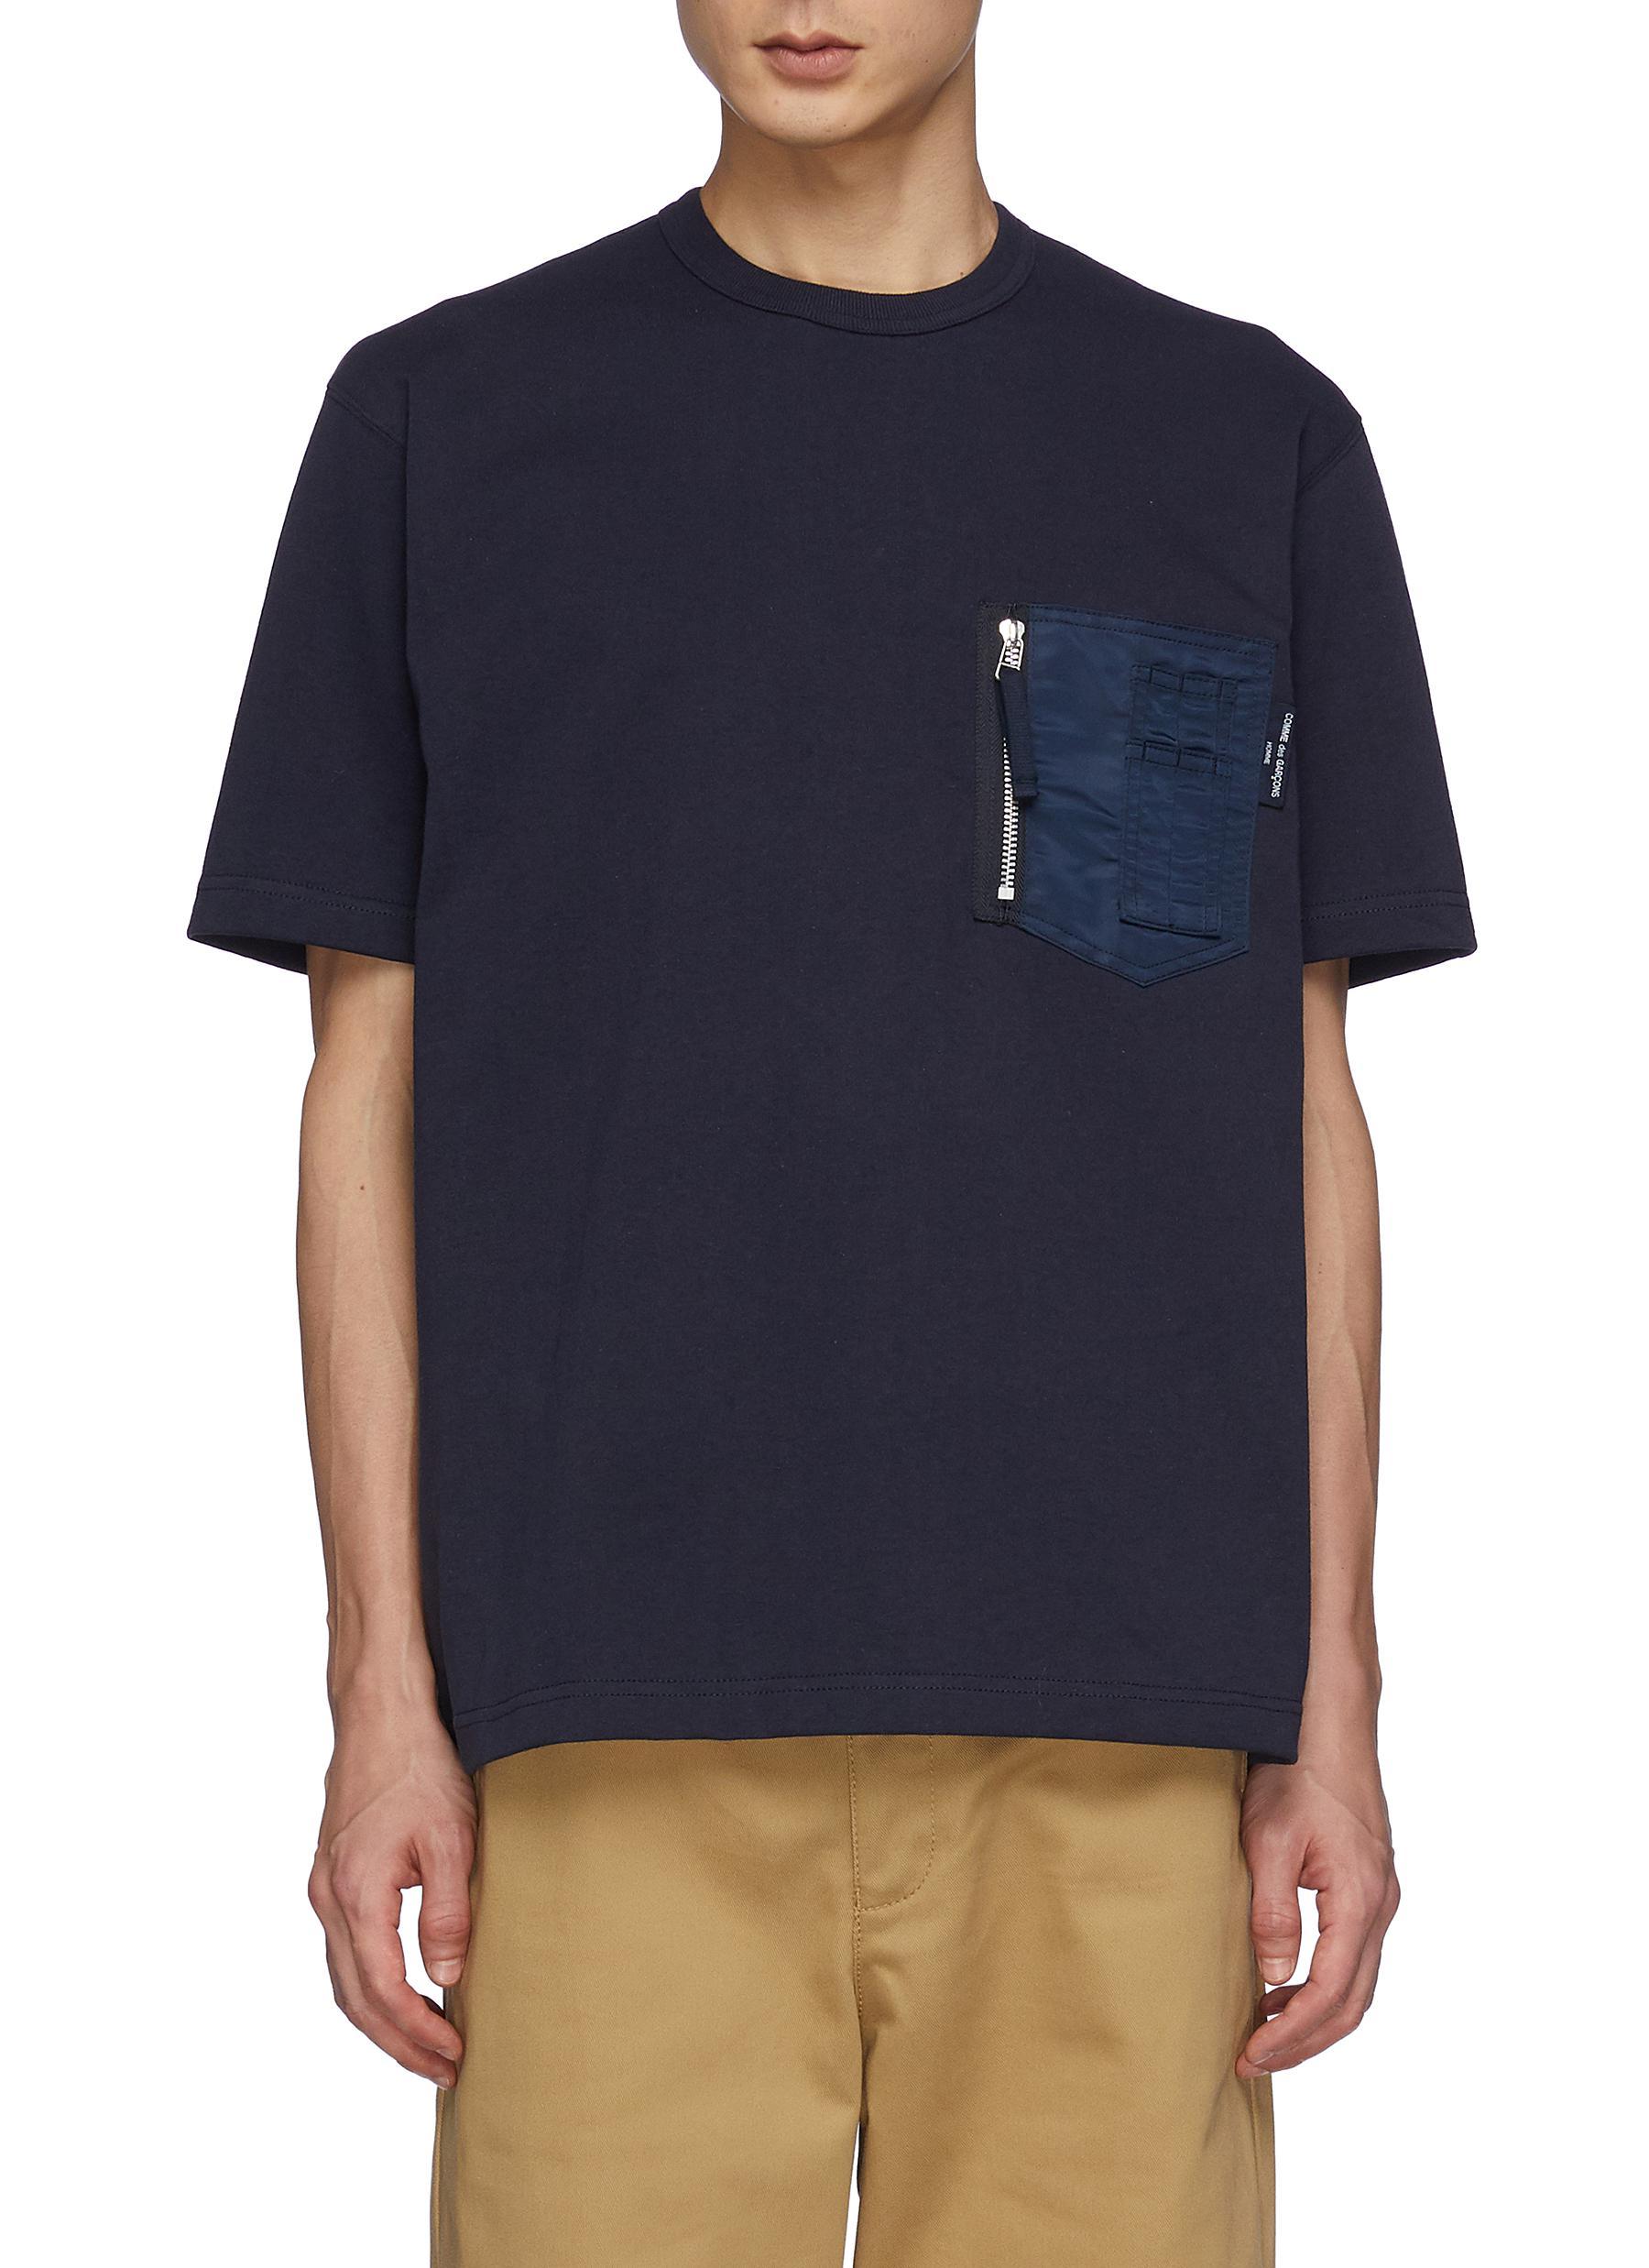 Cotton Crewneck Pocket T-Shirt